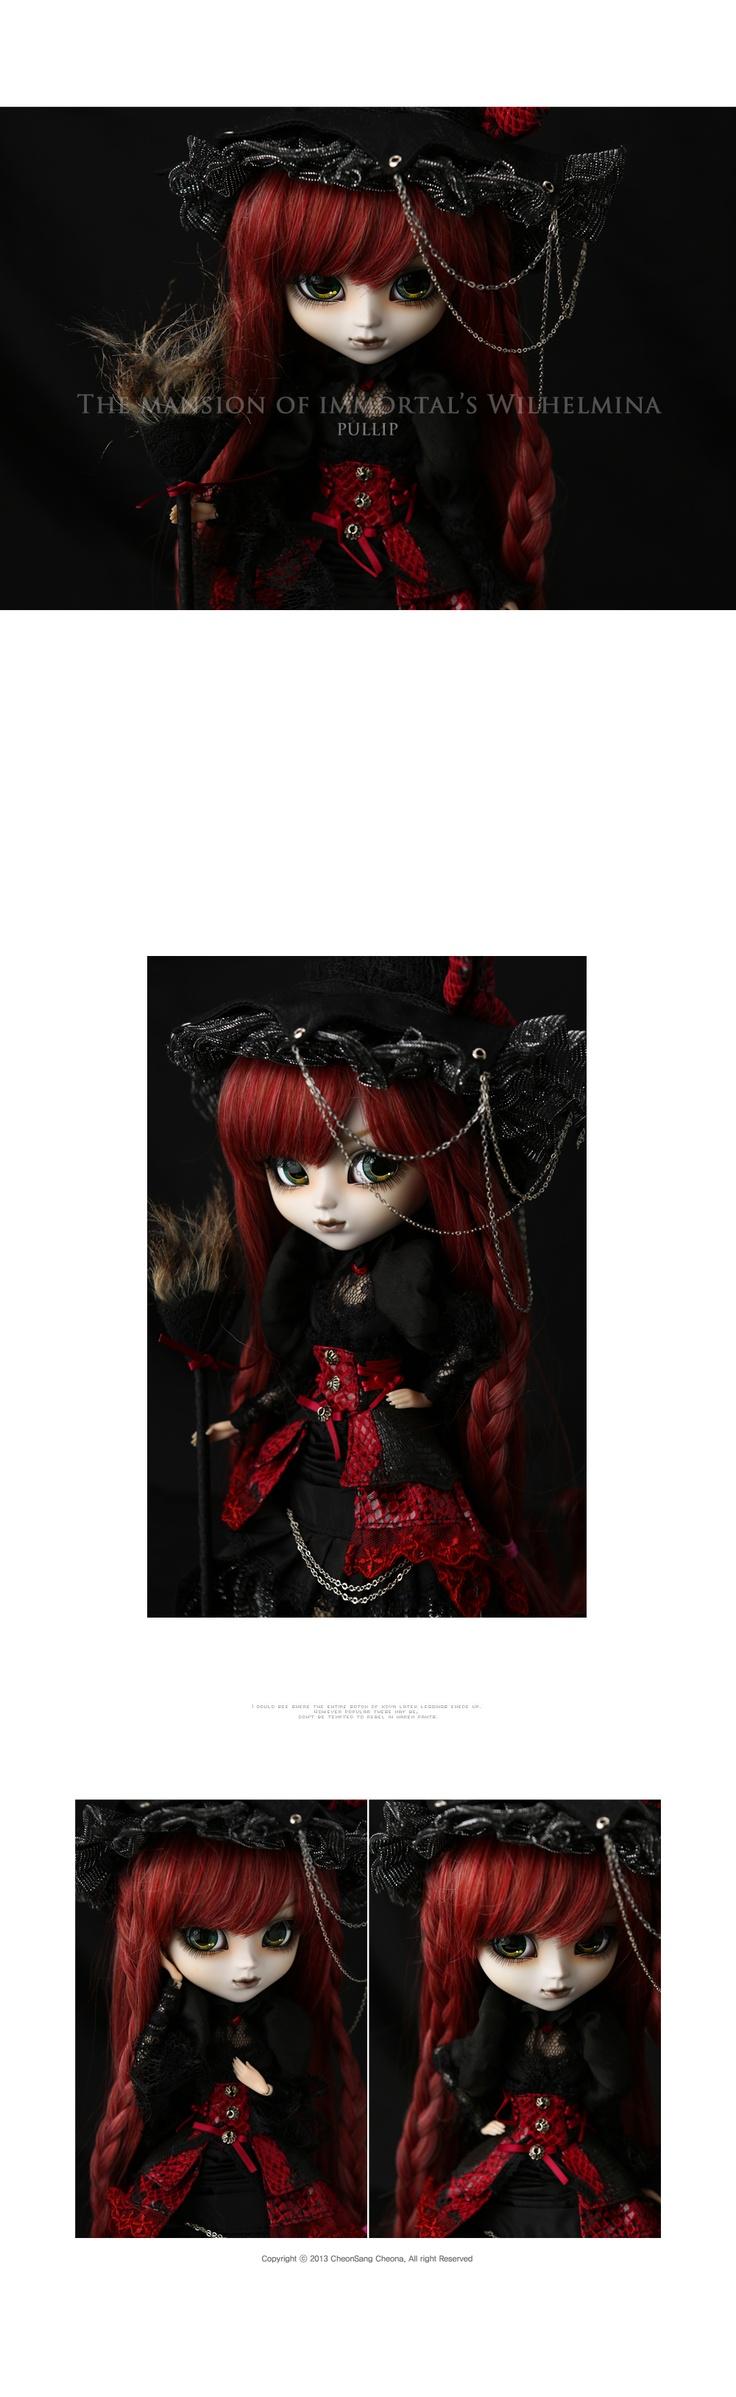 Pullip Wilhelmina doll